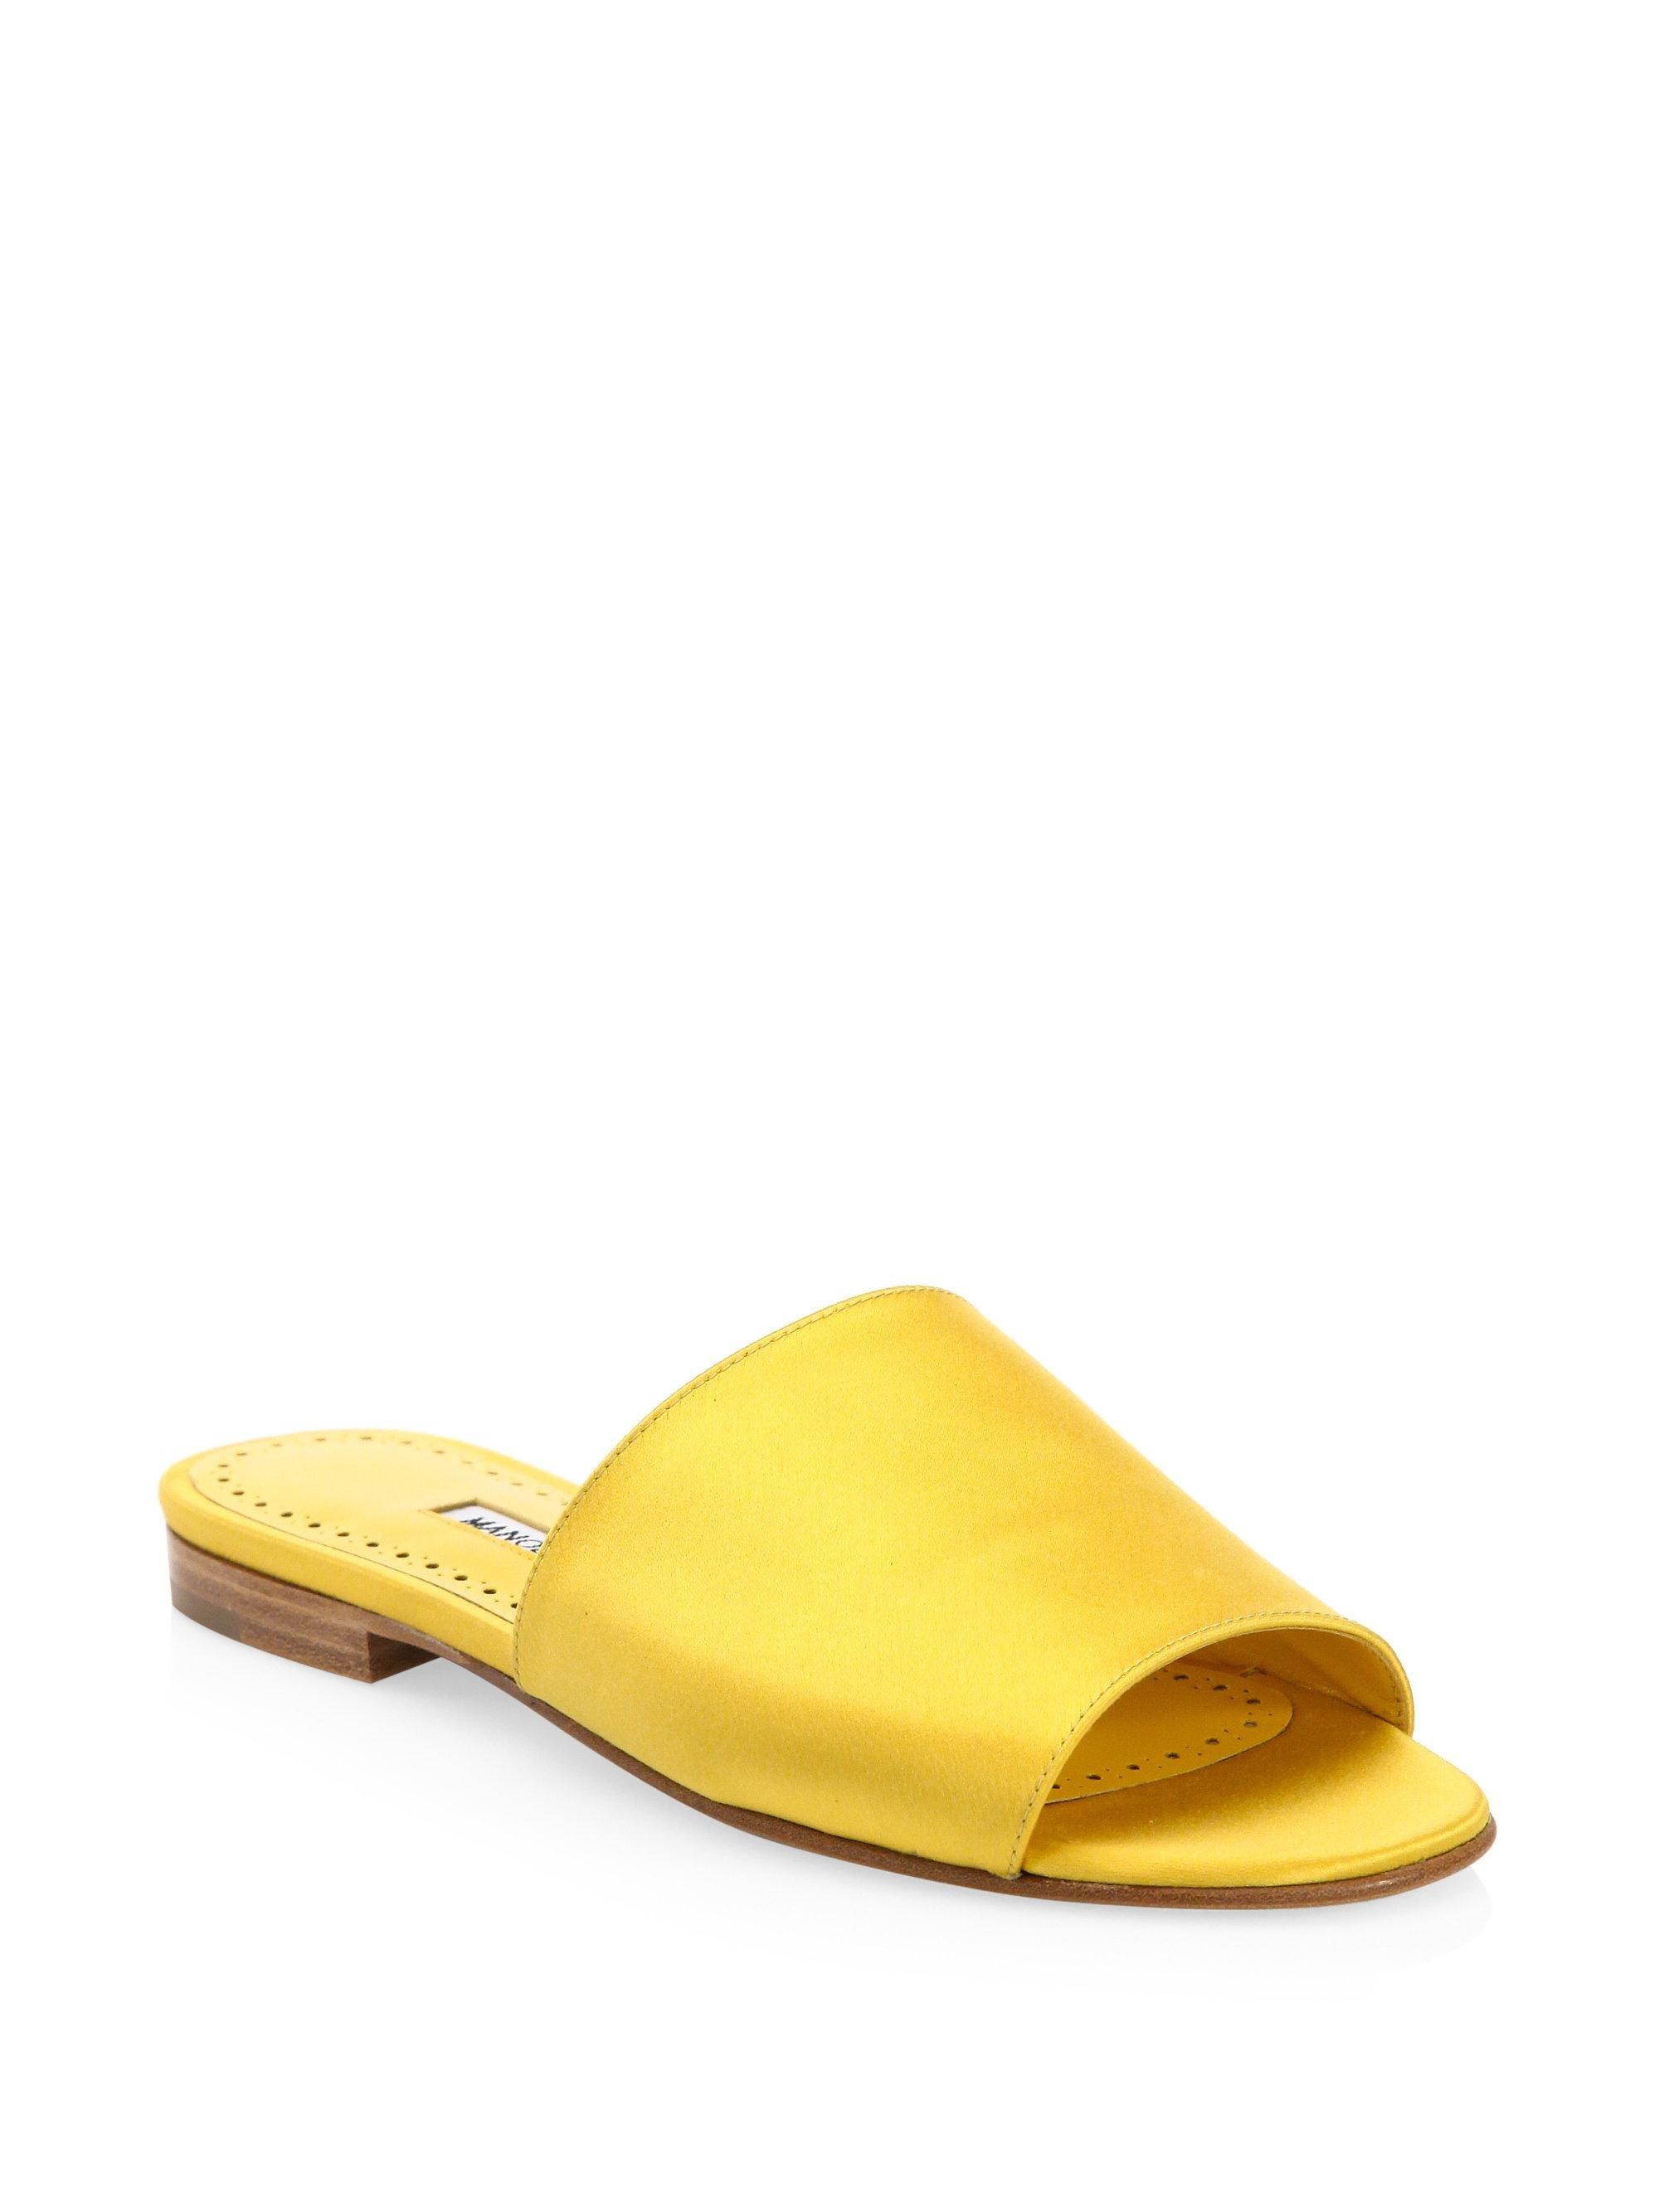 Manolo Blahnik Classic Open Toe Sandals 2dyUXQ2FzF